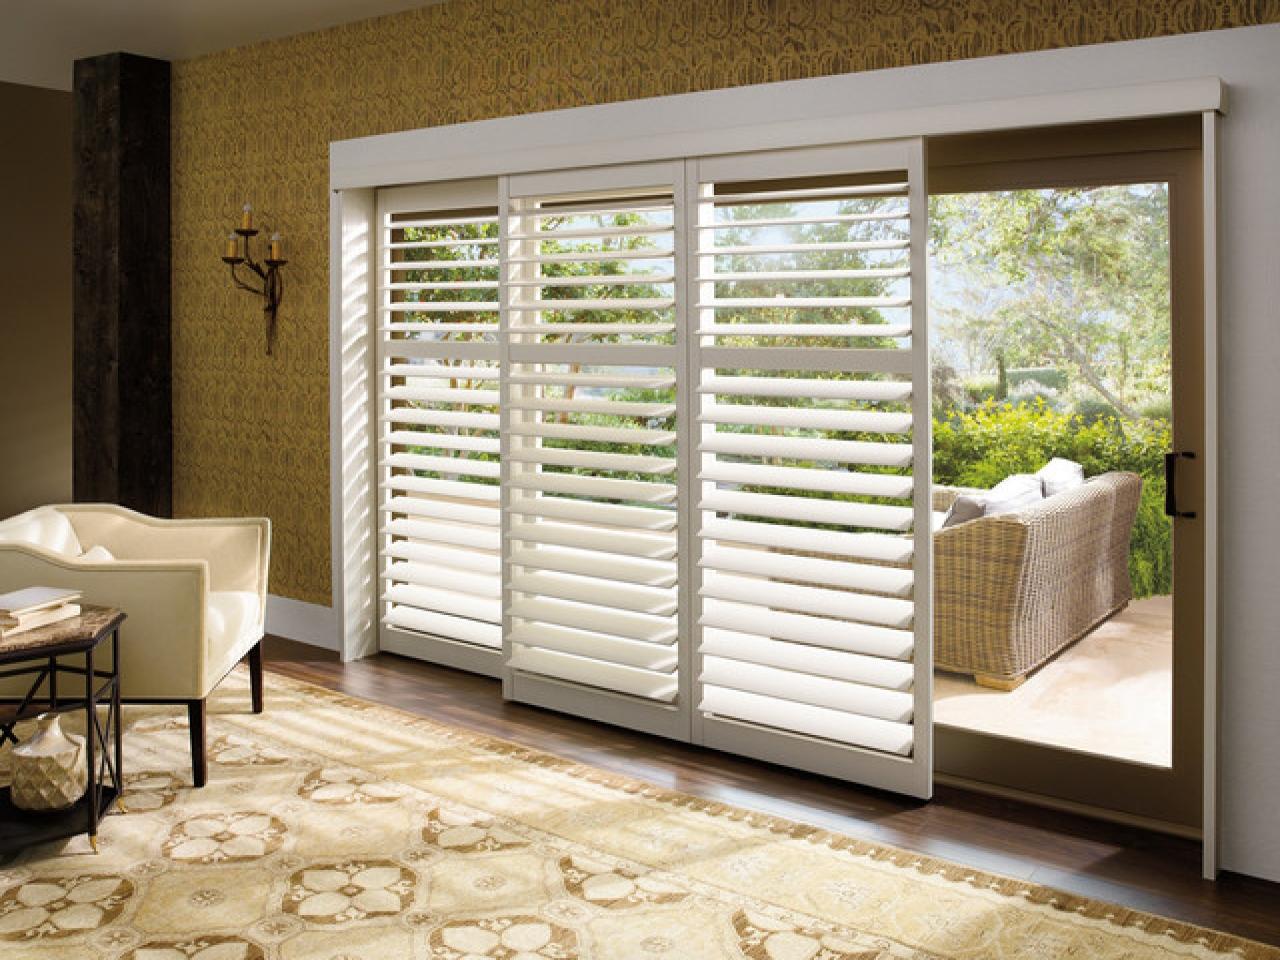 contemporary window treatments for sliding glass doors plantation shutters for sliding glass patio doors SEVXJOJ